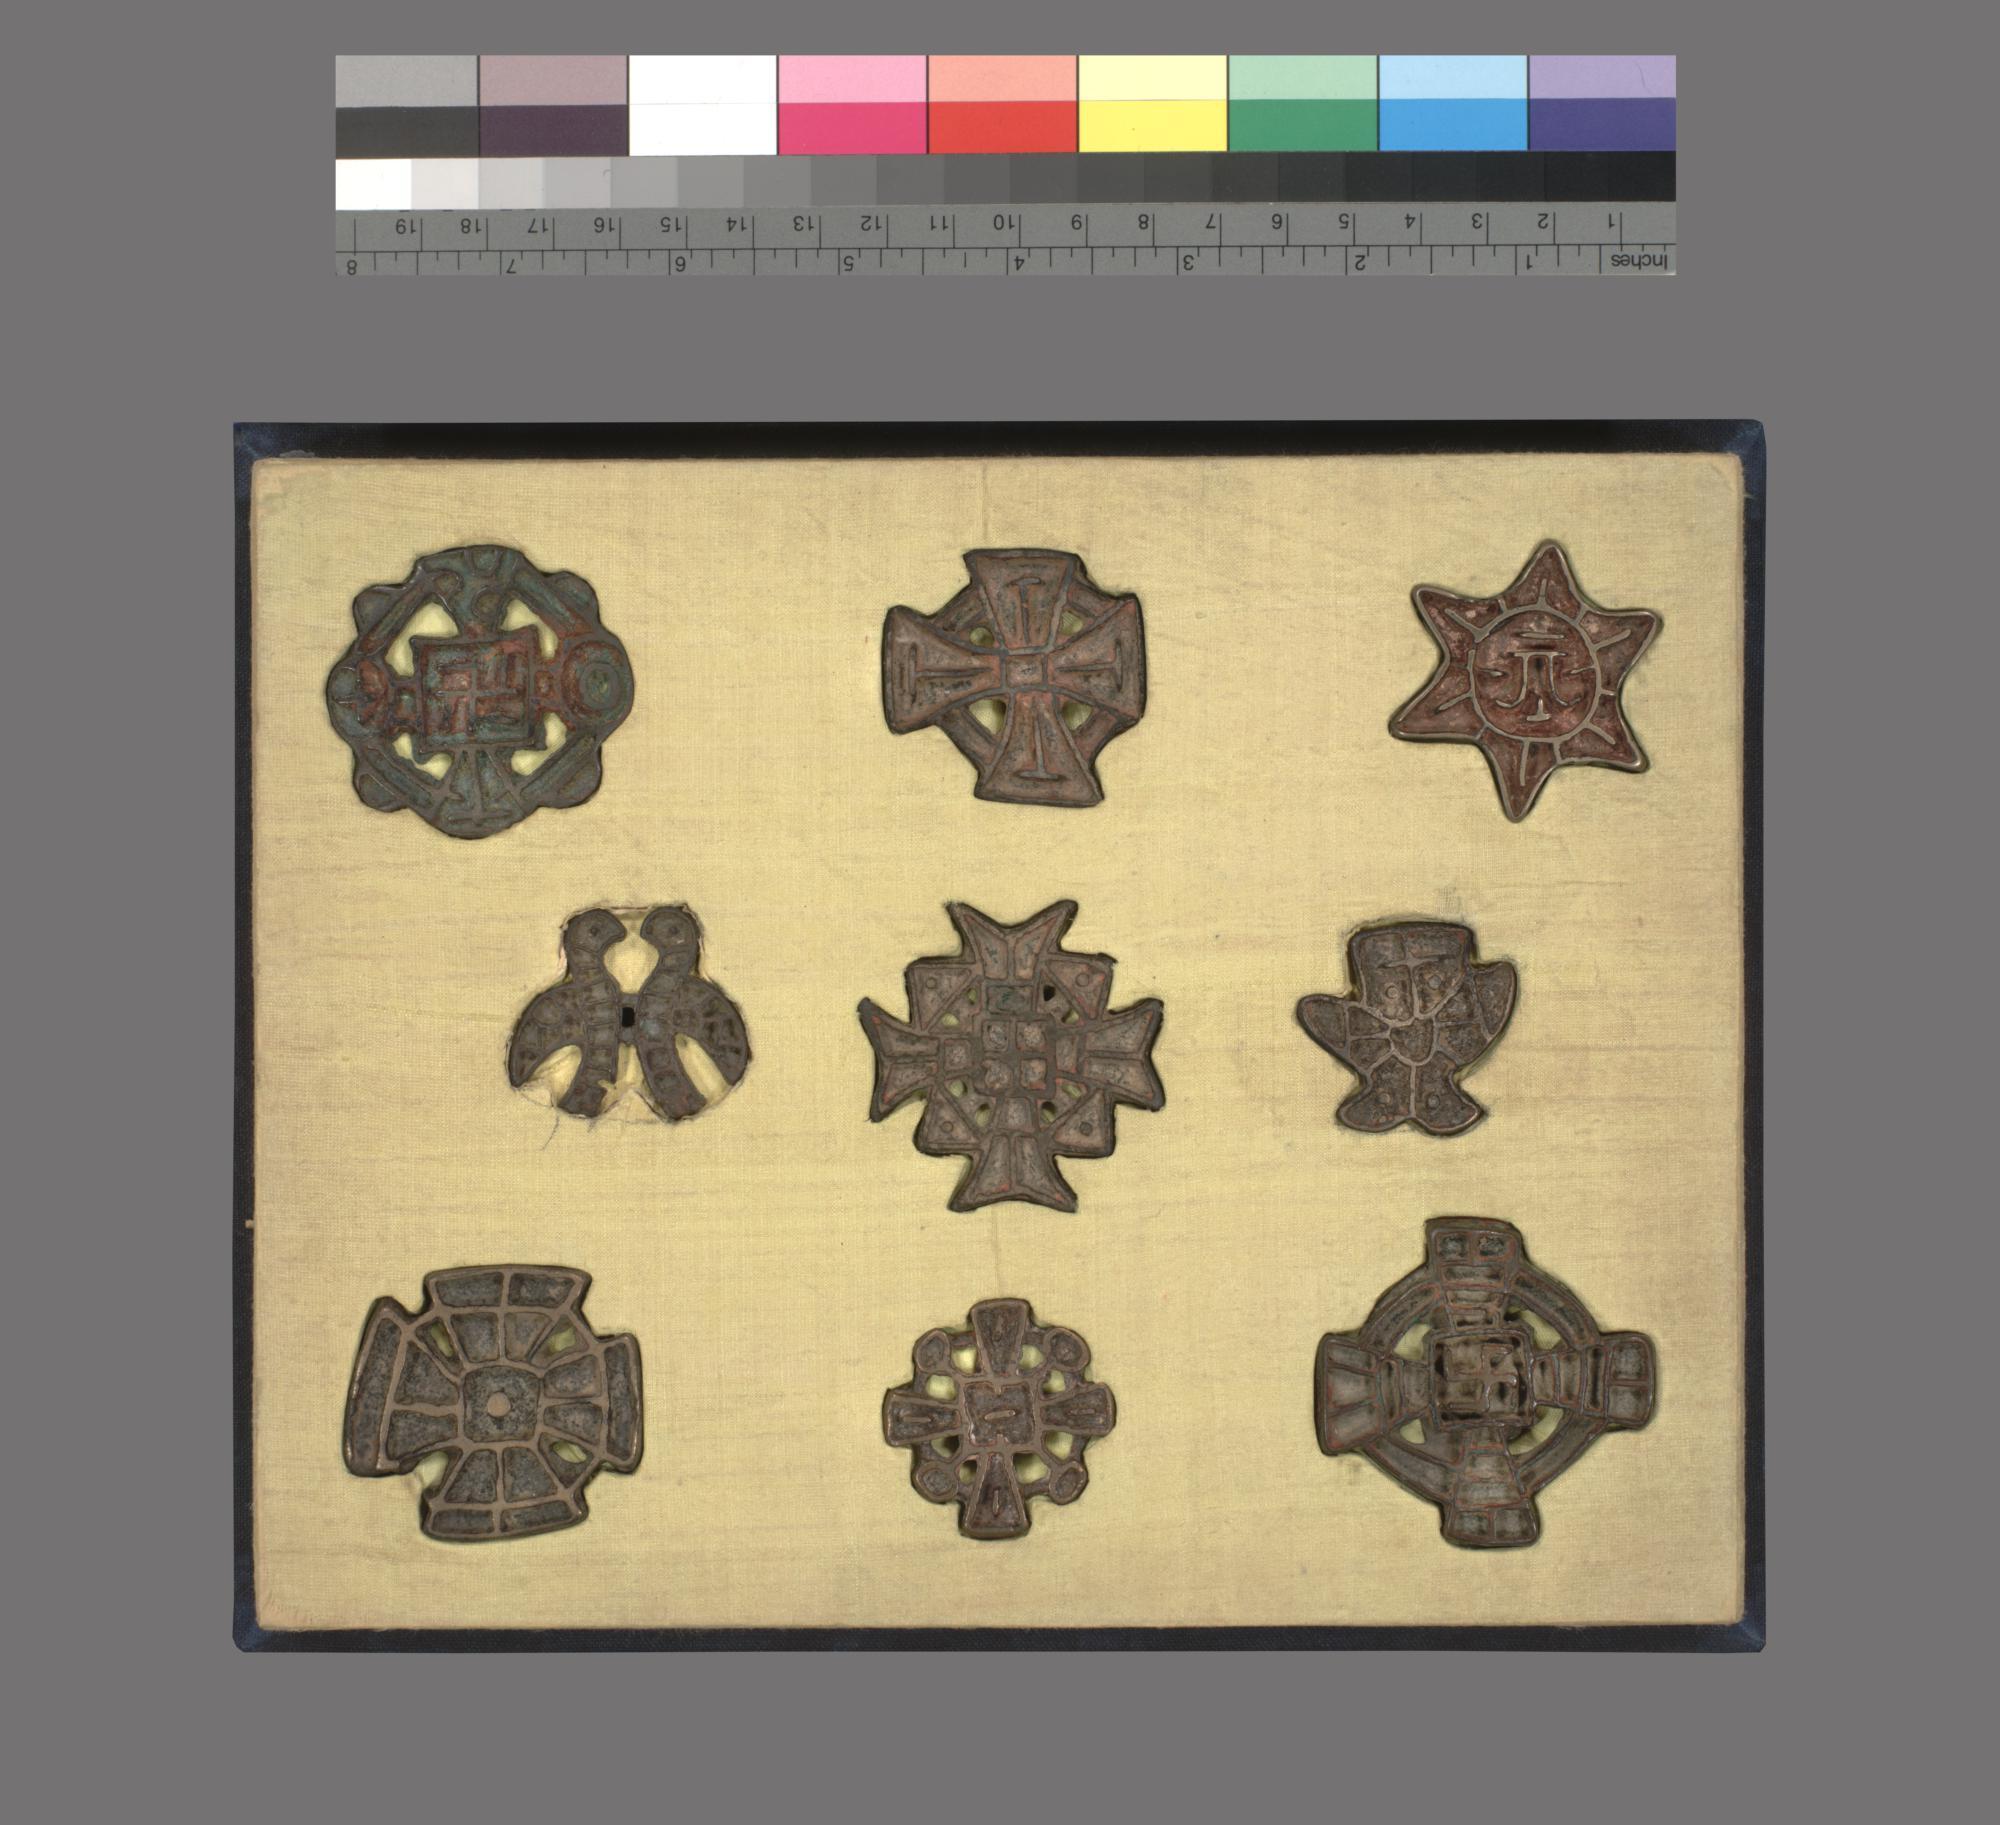 Nestorian Crosses